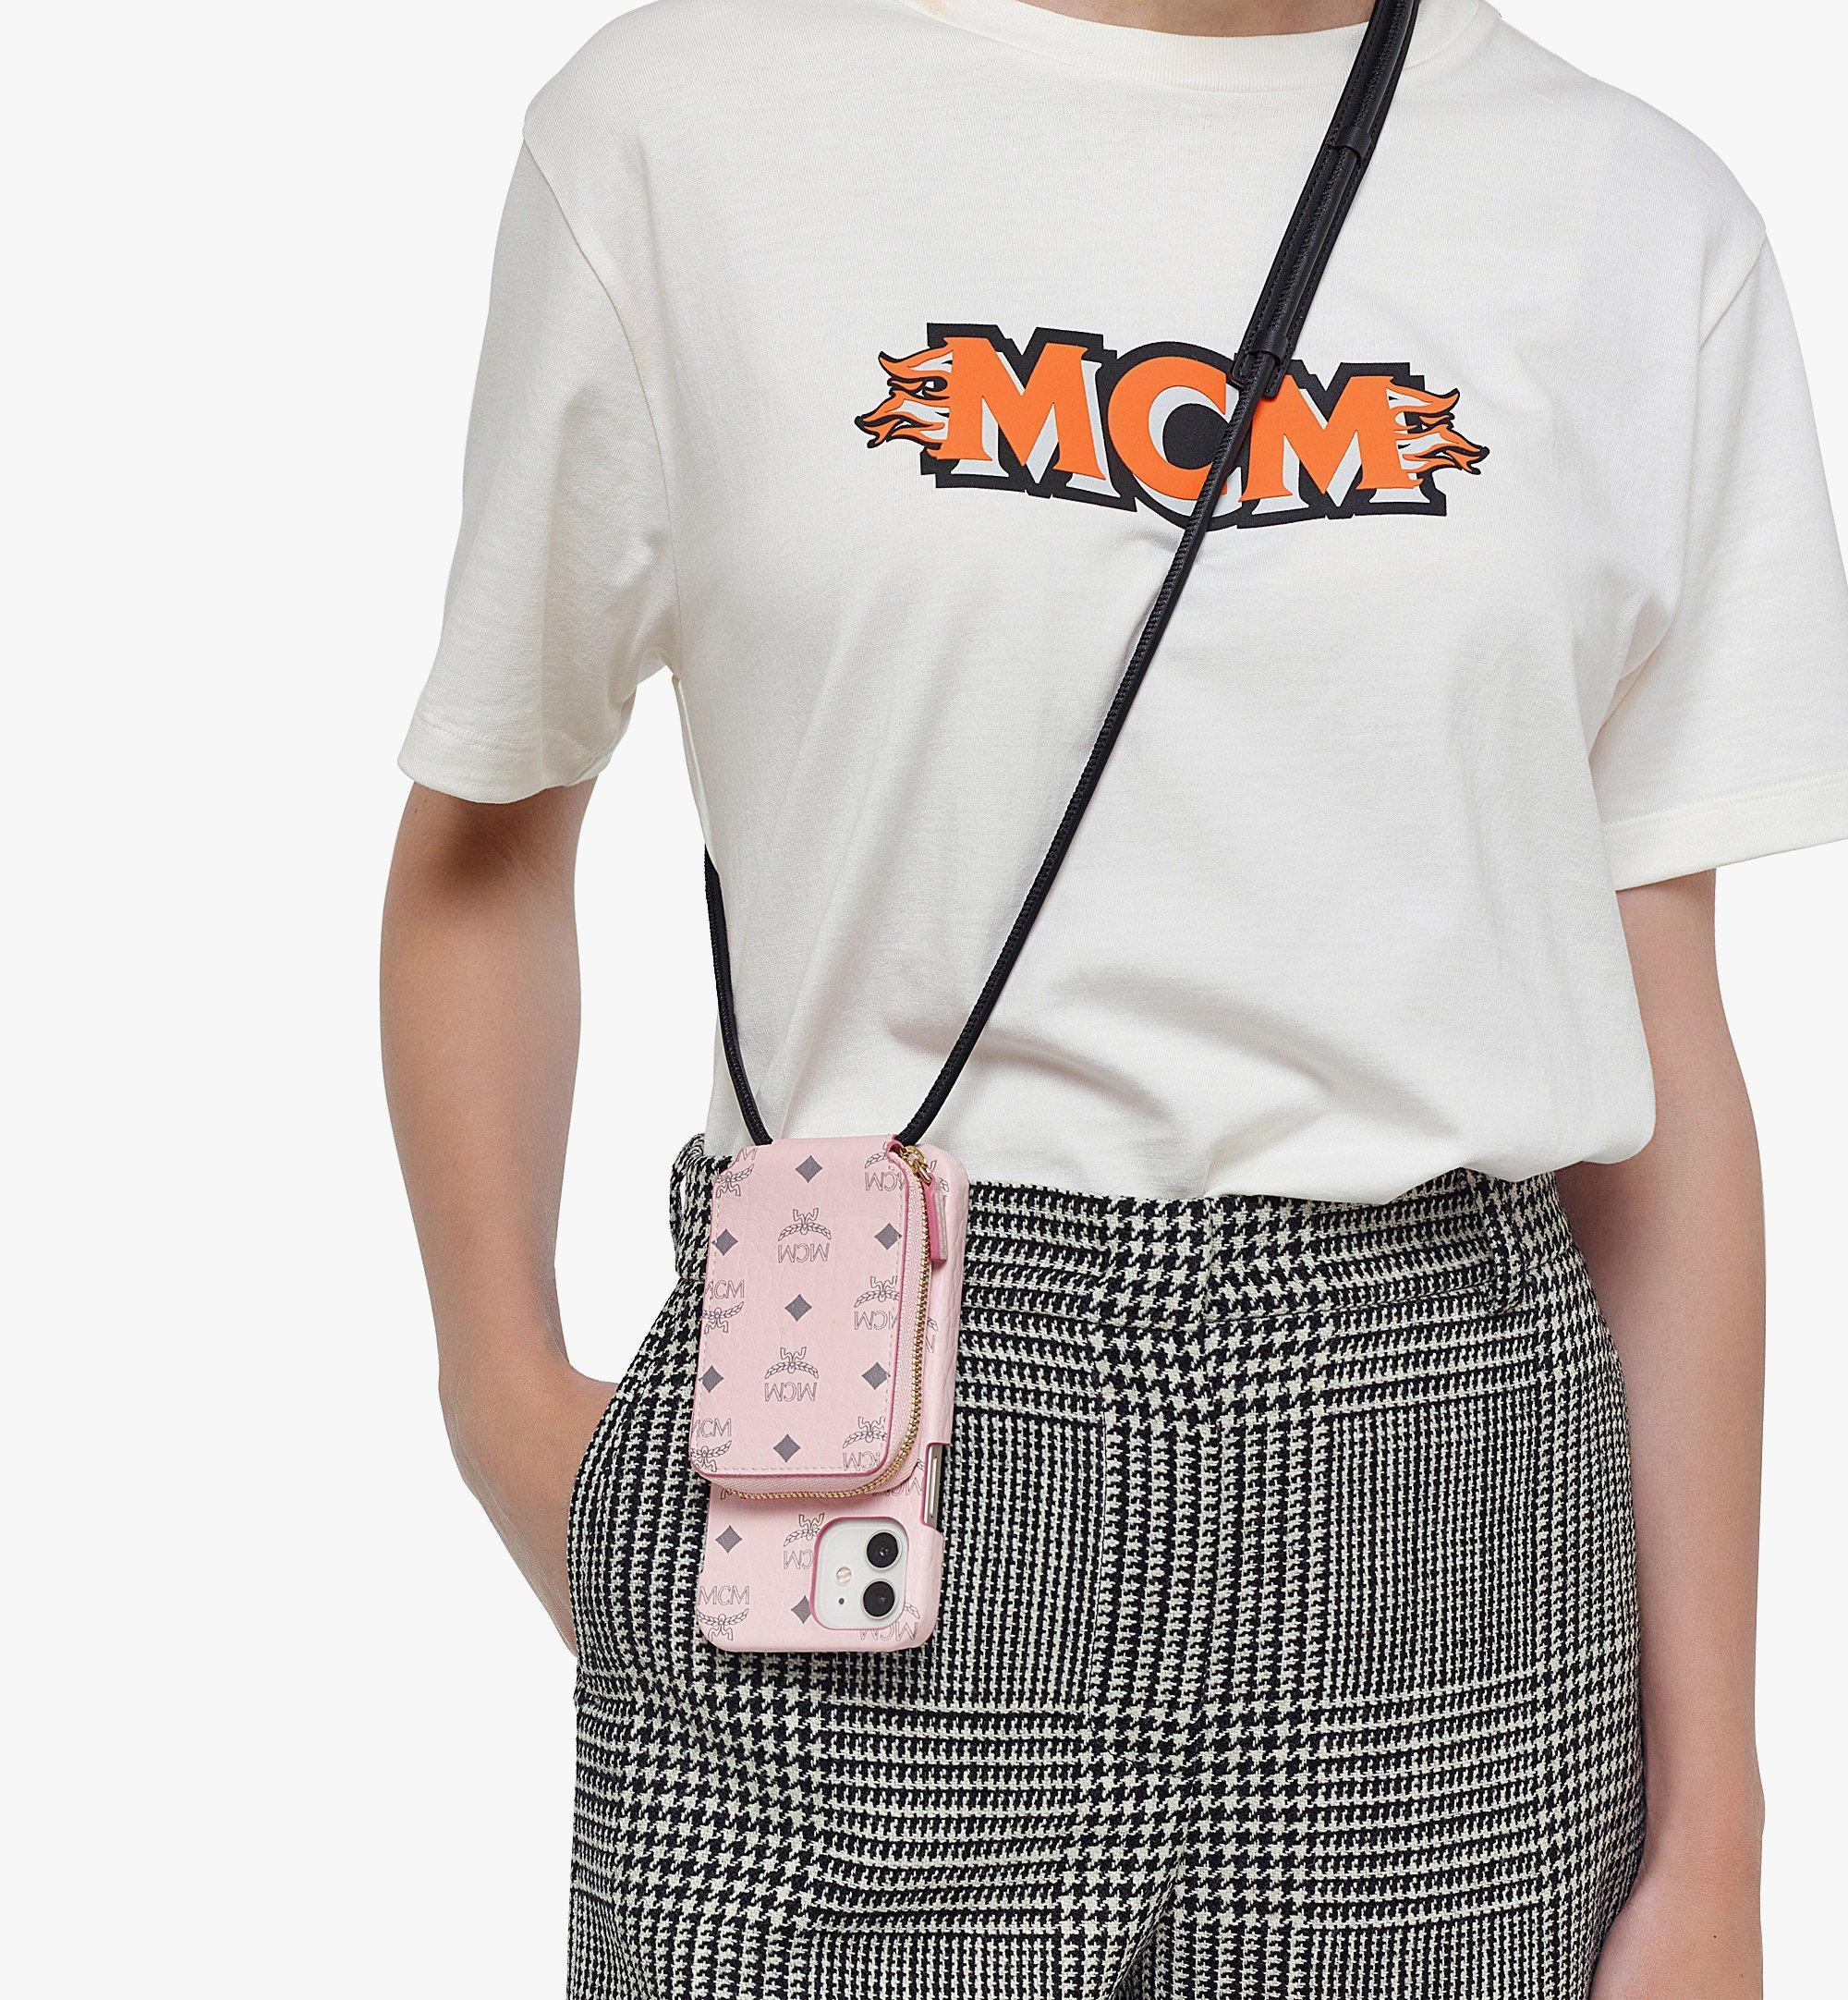 MCM iPhone 12/12 Proケース ジップポケット付き - Visetos Original Pink MXEBAVI01QH001 ほかの角度から見る 2